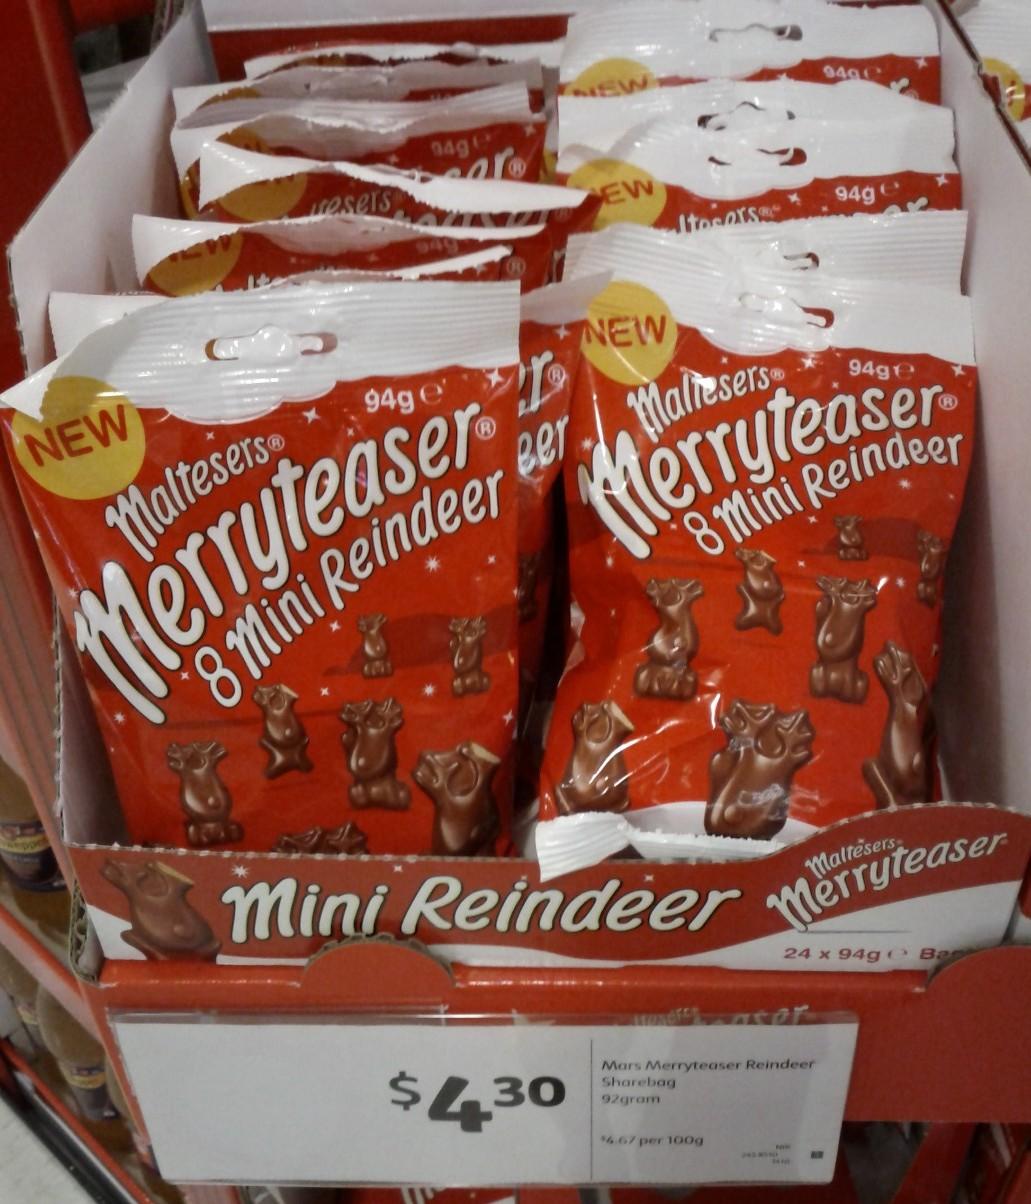 Mars Maltesers 92g Merryteaser Reindeer